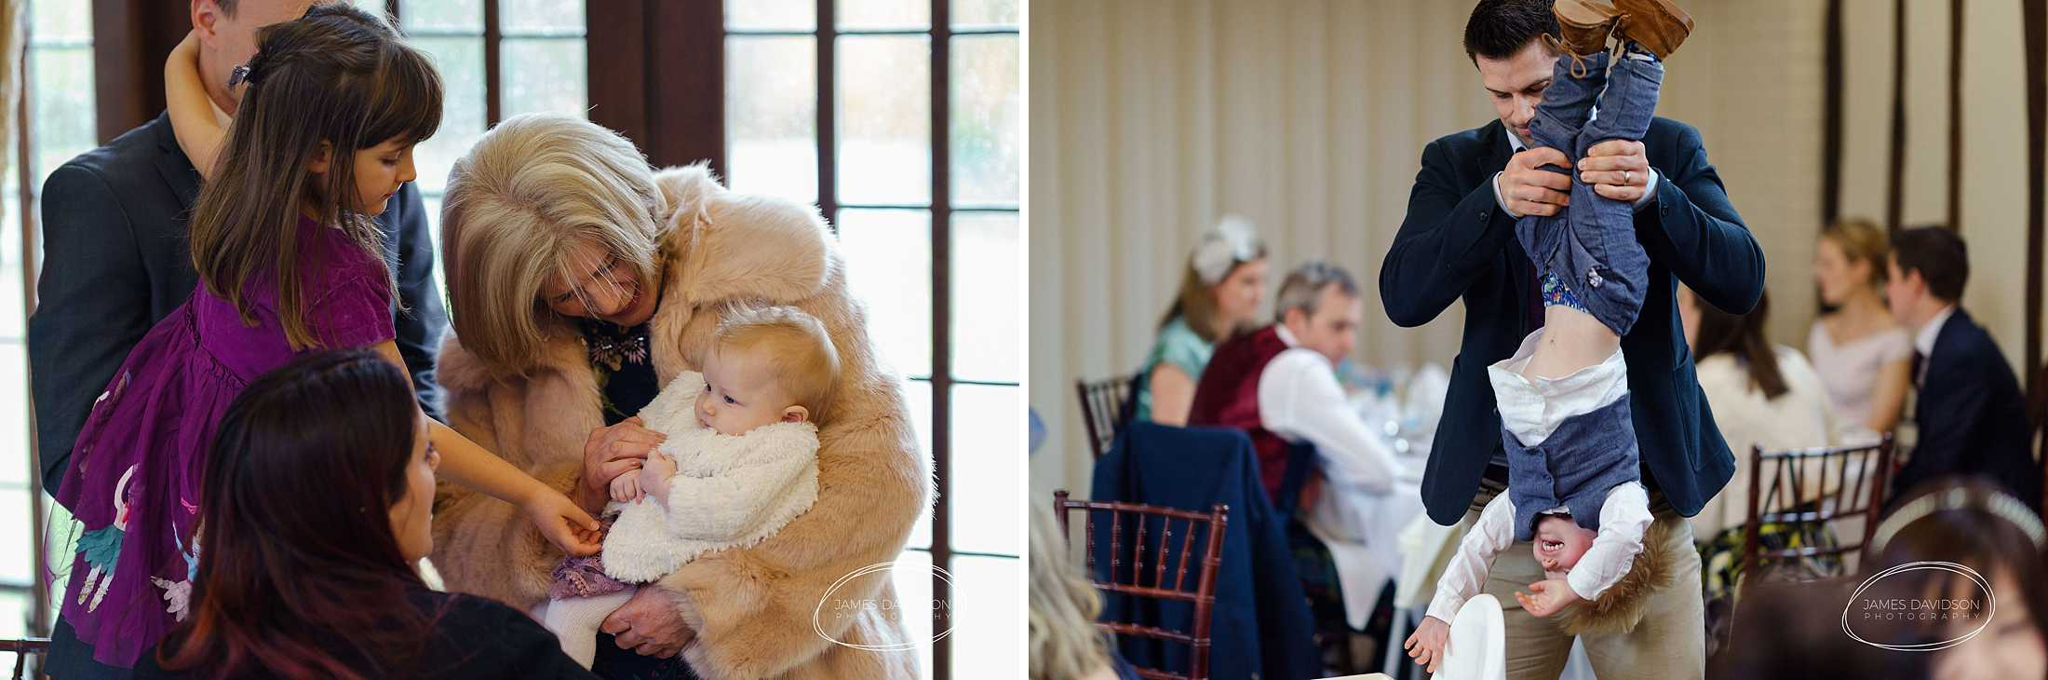 seckford-hall-wedding-075